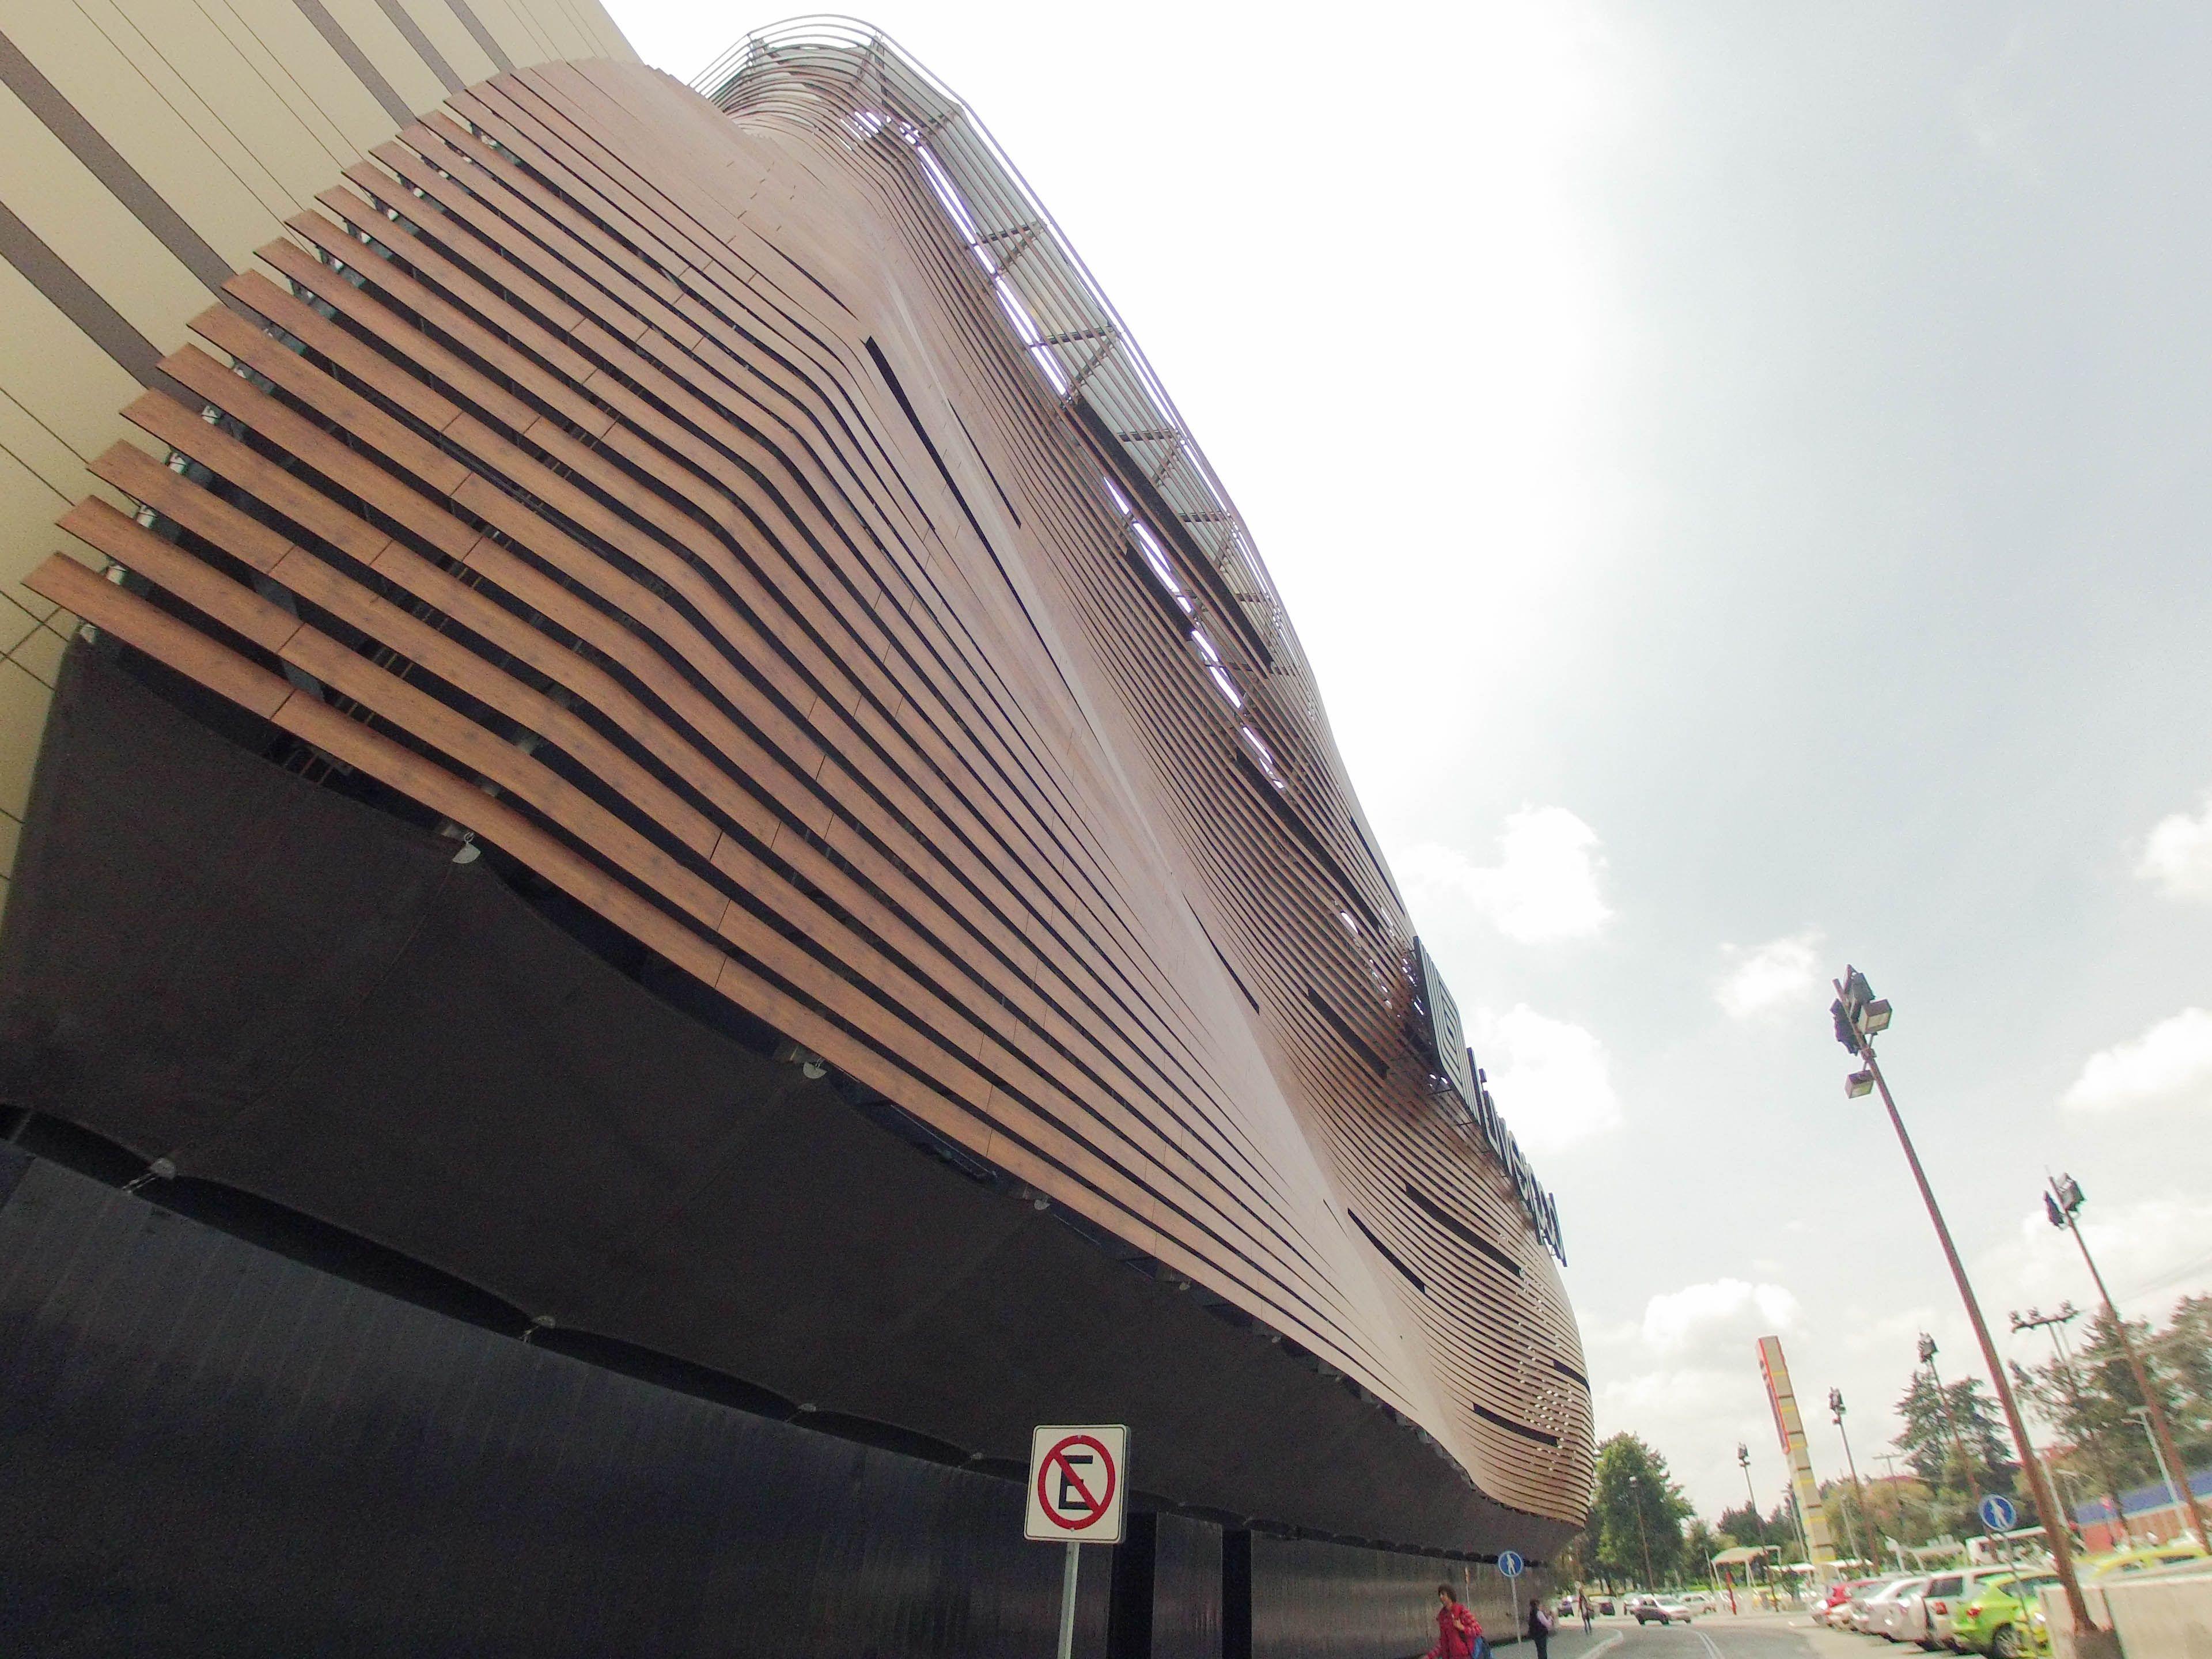 Liverpool Toluca Mexico Fundermax Facade design wood color texture